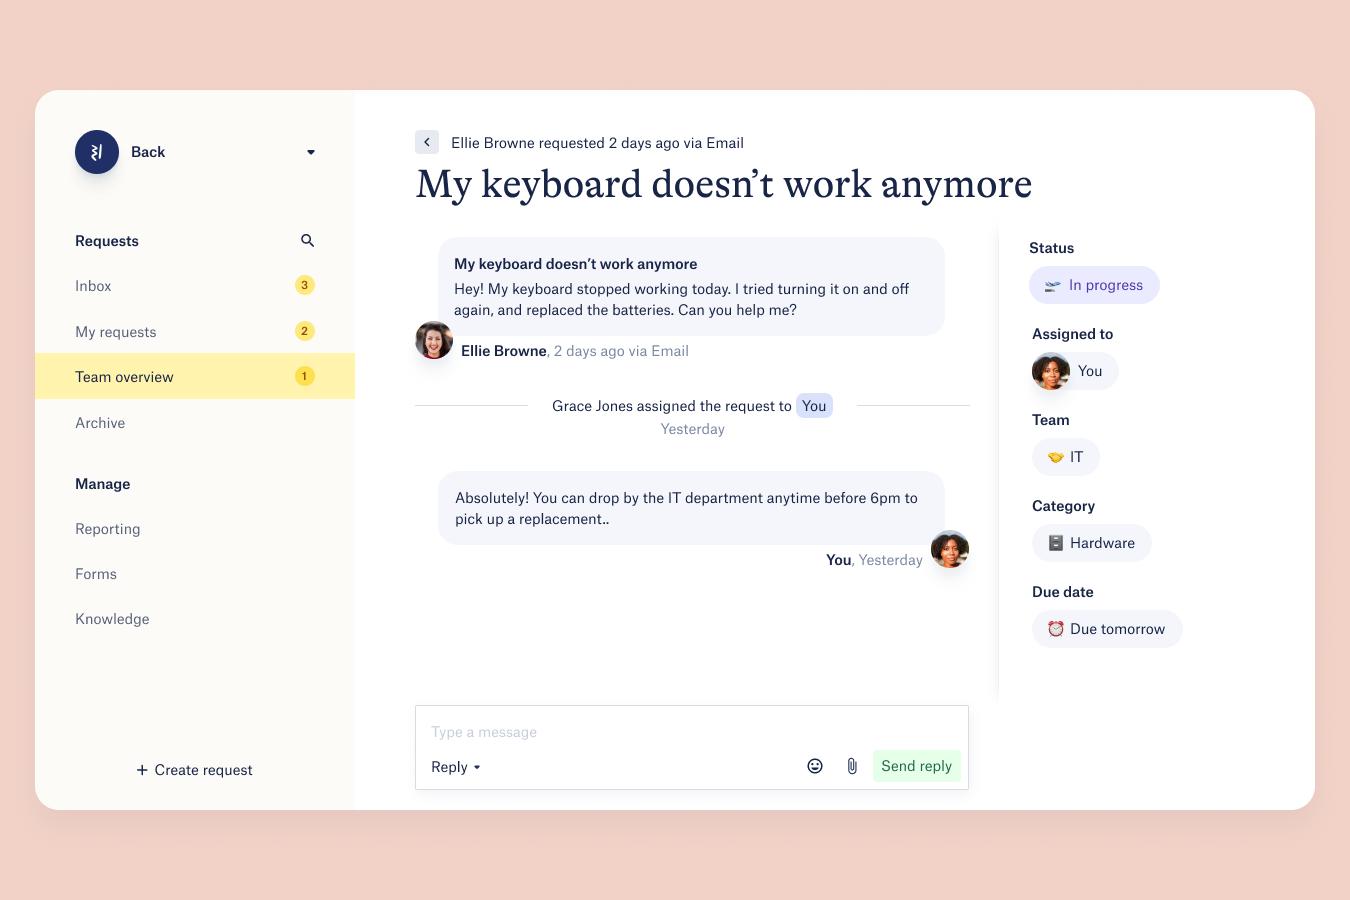 Back communication screenshot